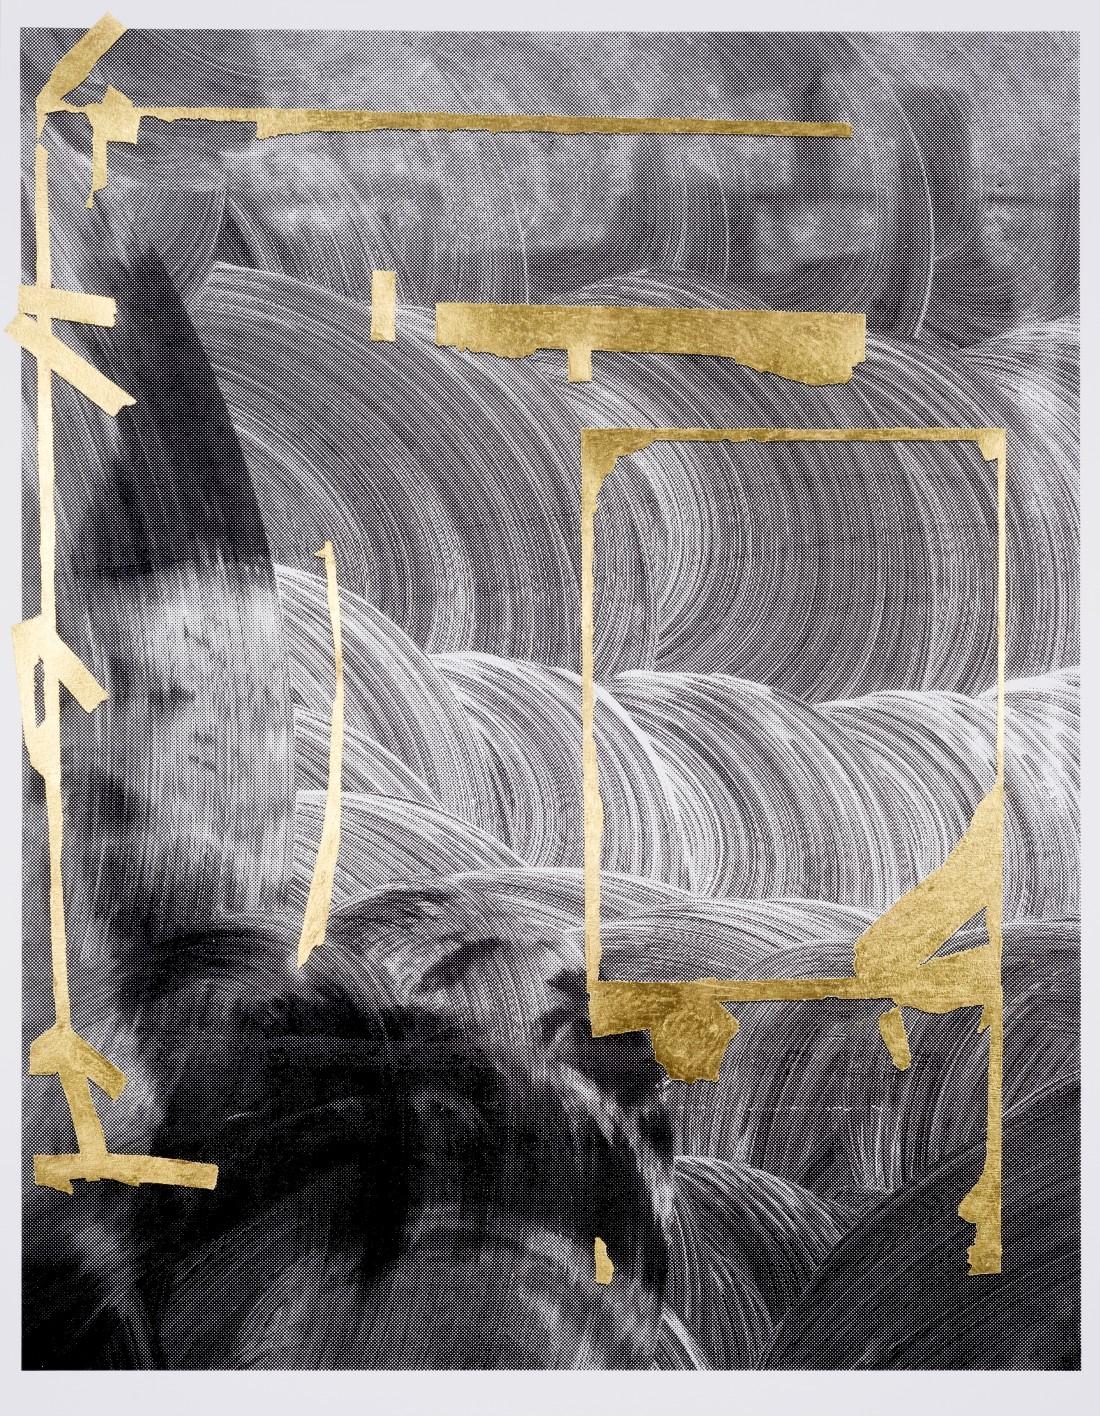 Coanis 2014 screen print, (23 karat) gold leaf on paper